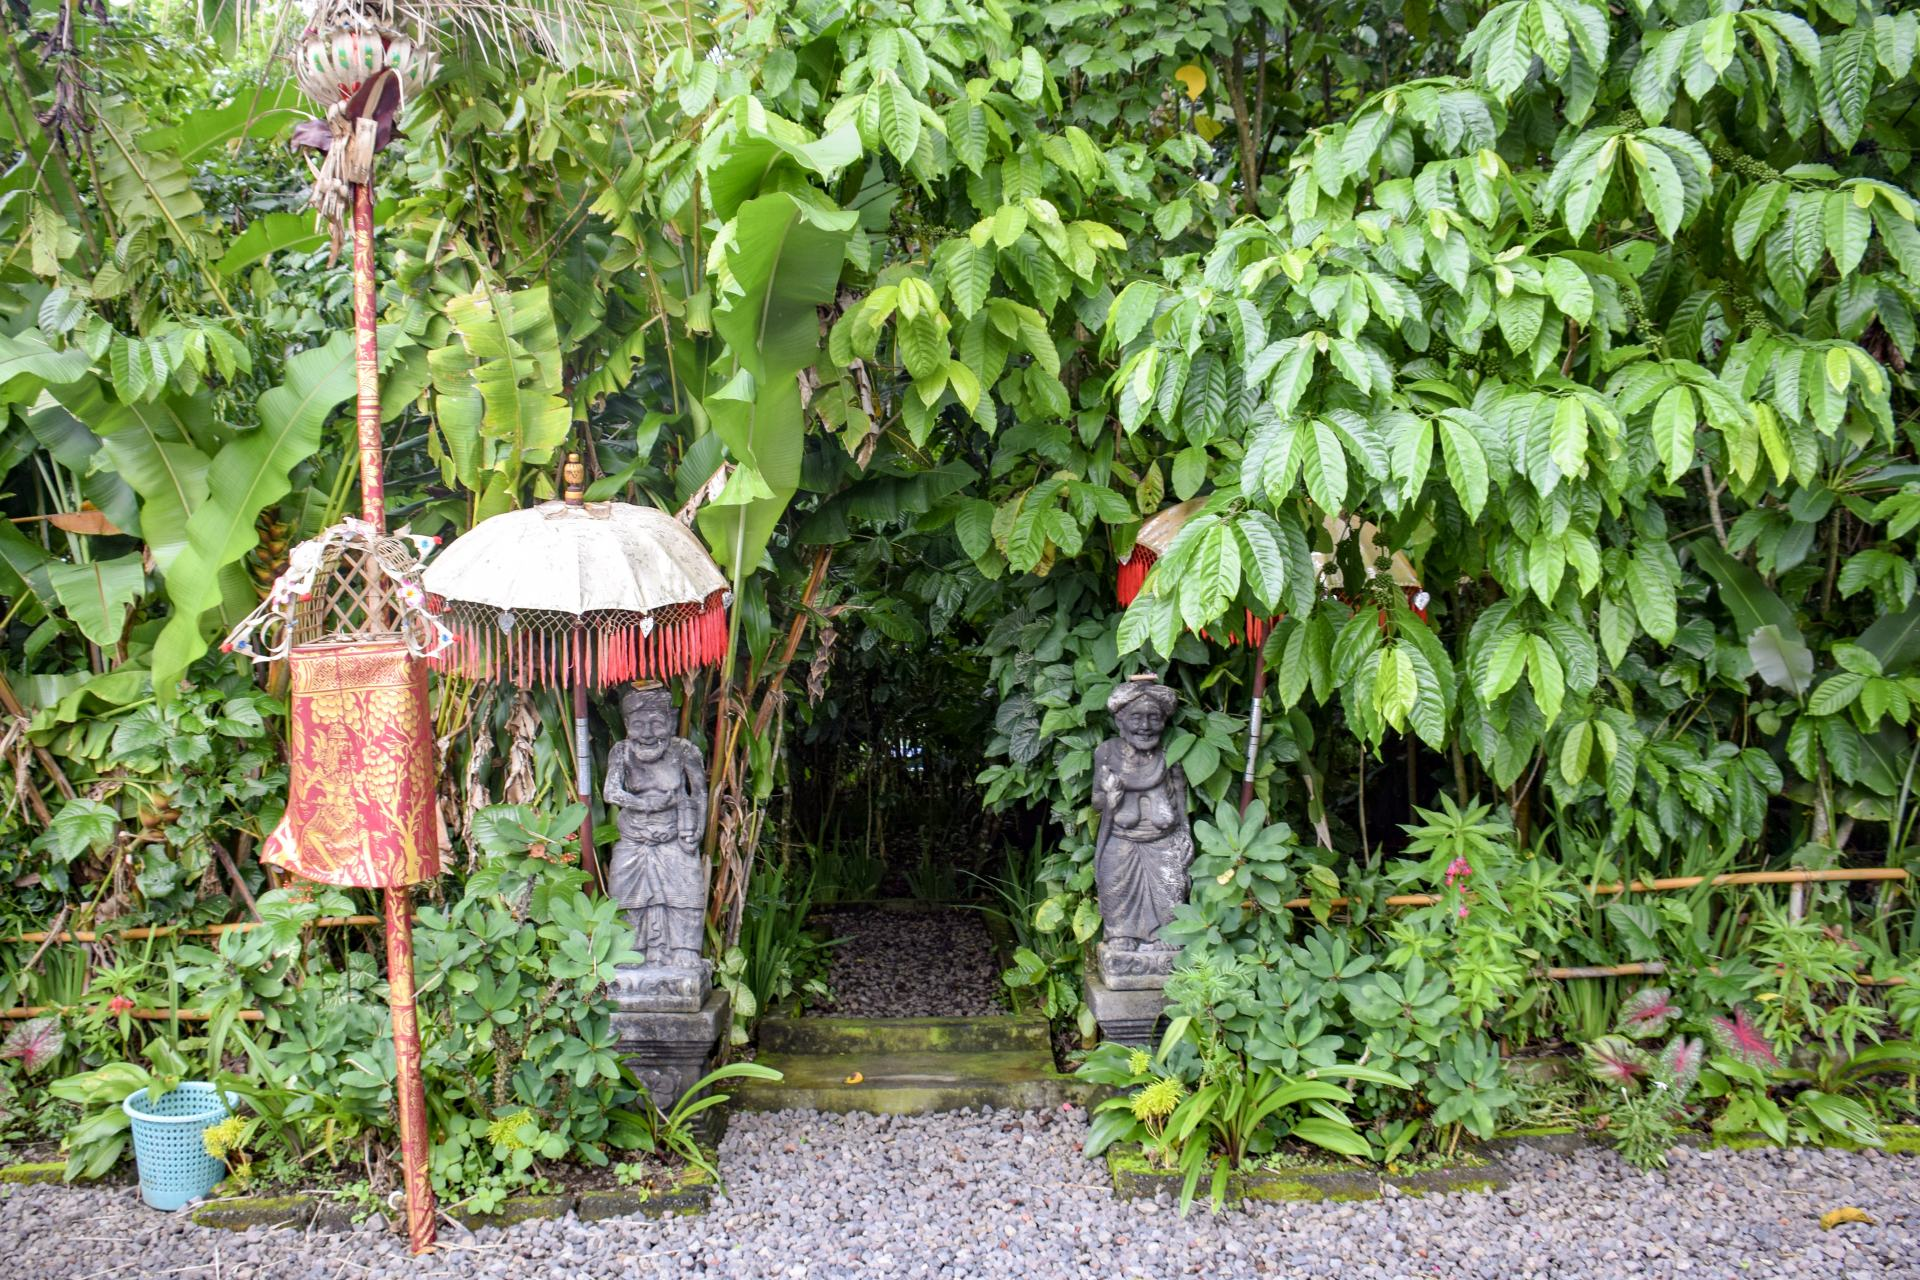 Alam Bali Agrowisata